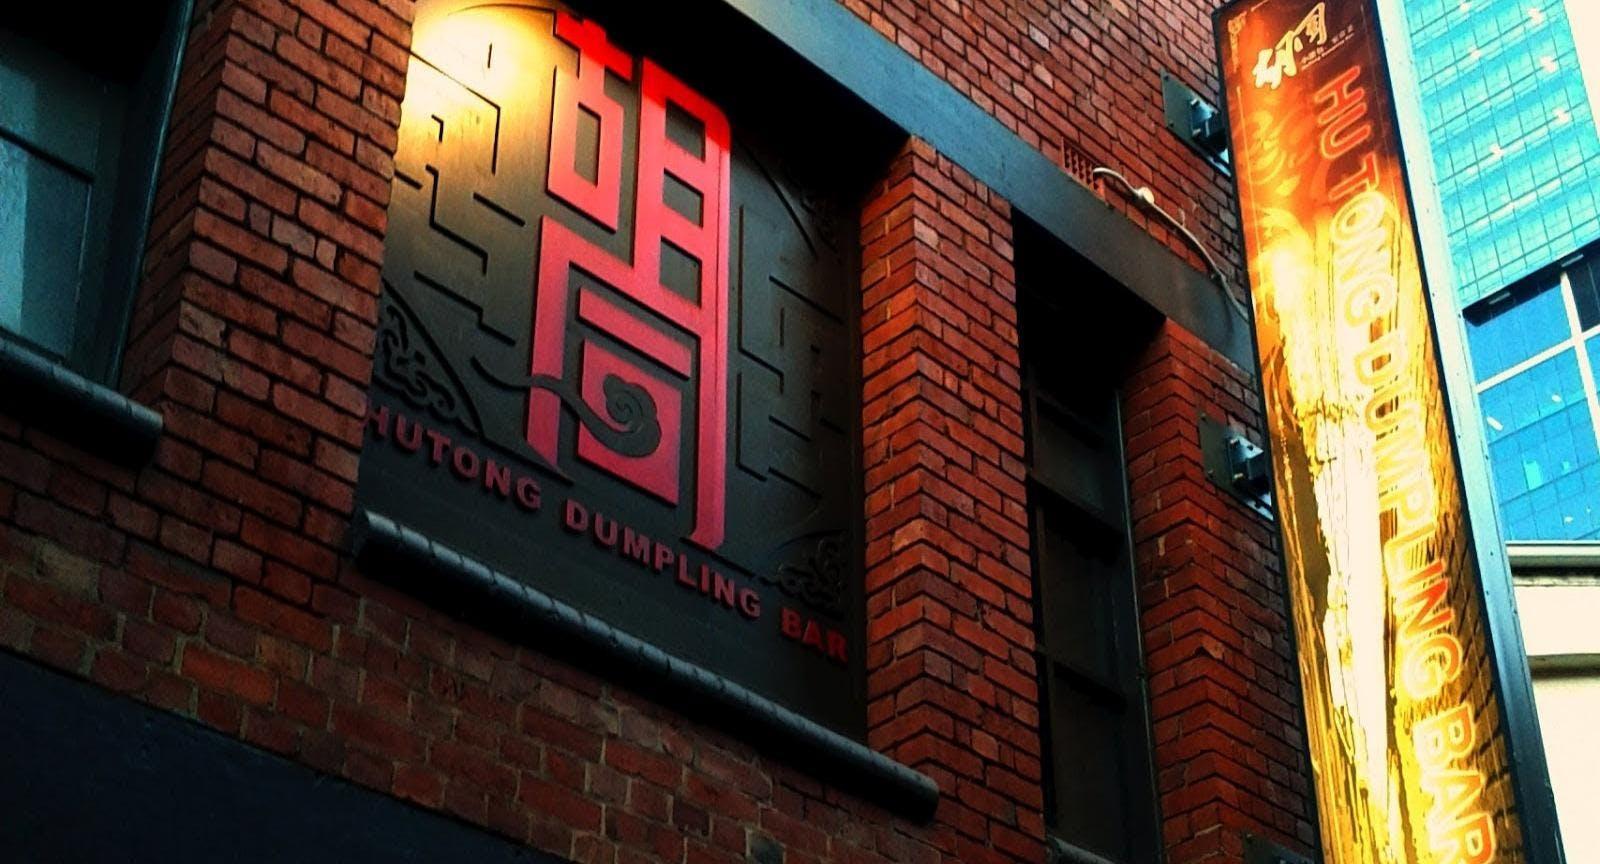 HuTong Dumpling Bar Melbourne image 3